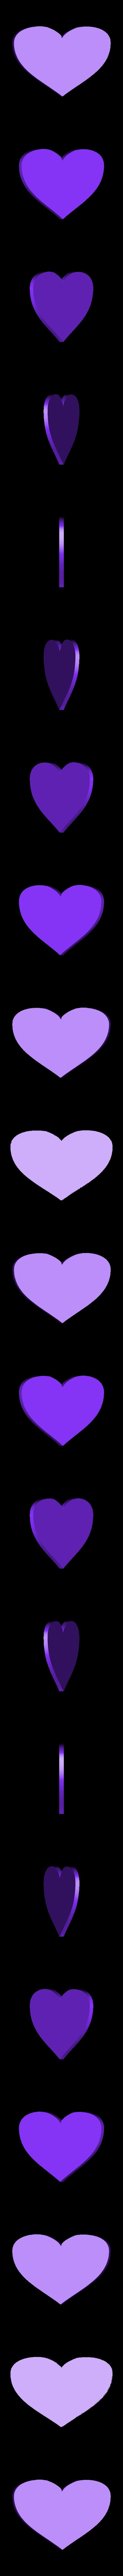 coeur plein trés grand.stl Download STL file panda hearts decoration • 3D printer template, catf3d